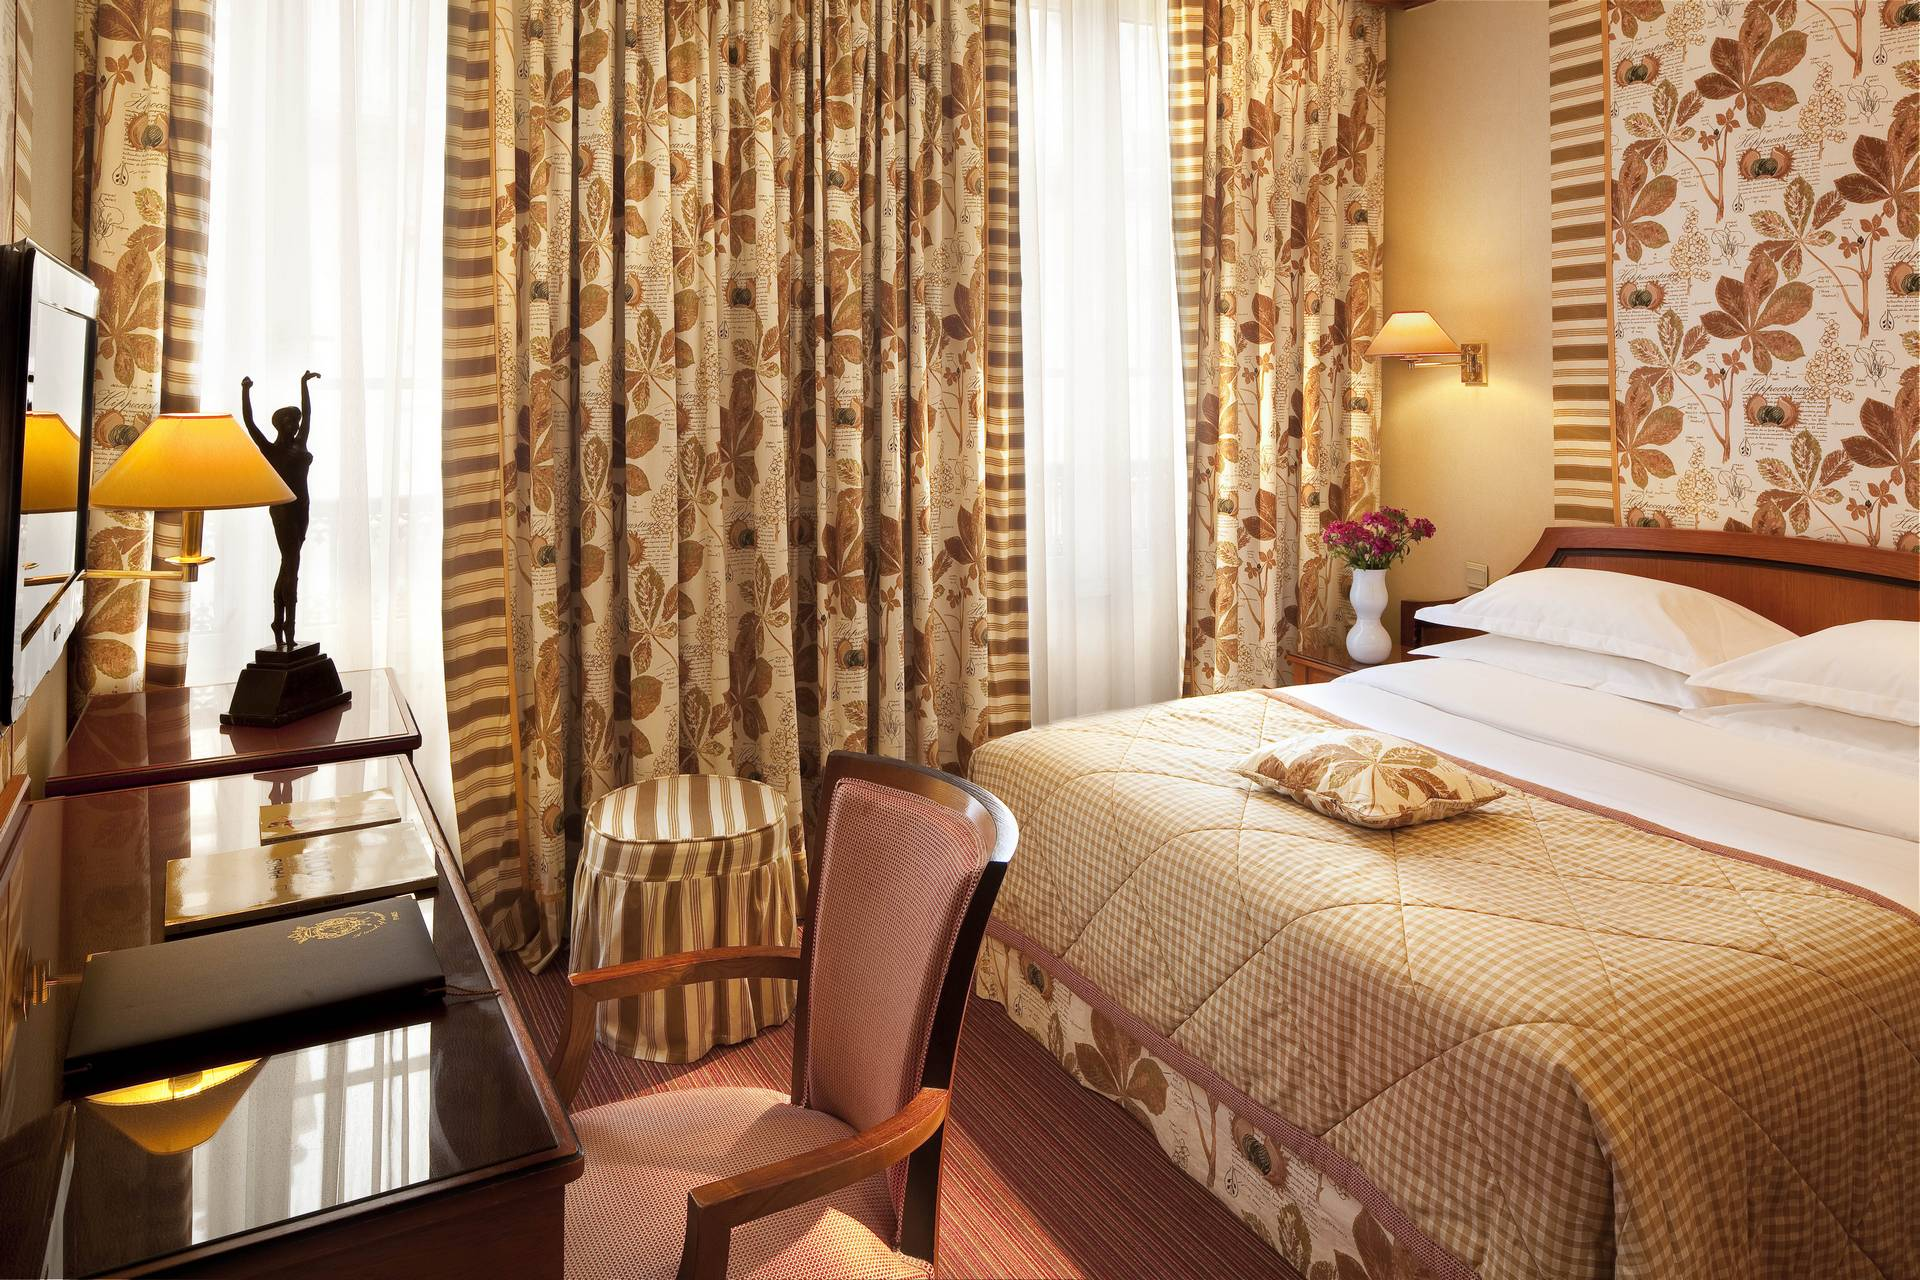 Rooms: Hôtel Horset Opéra Paris